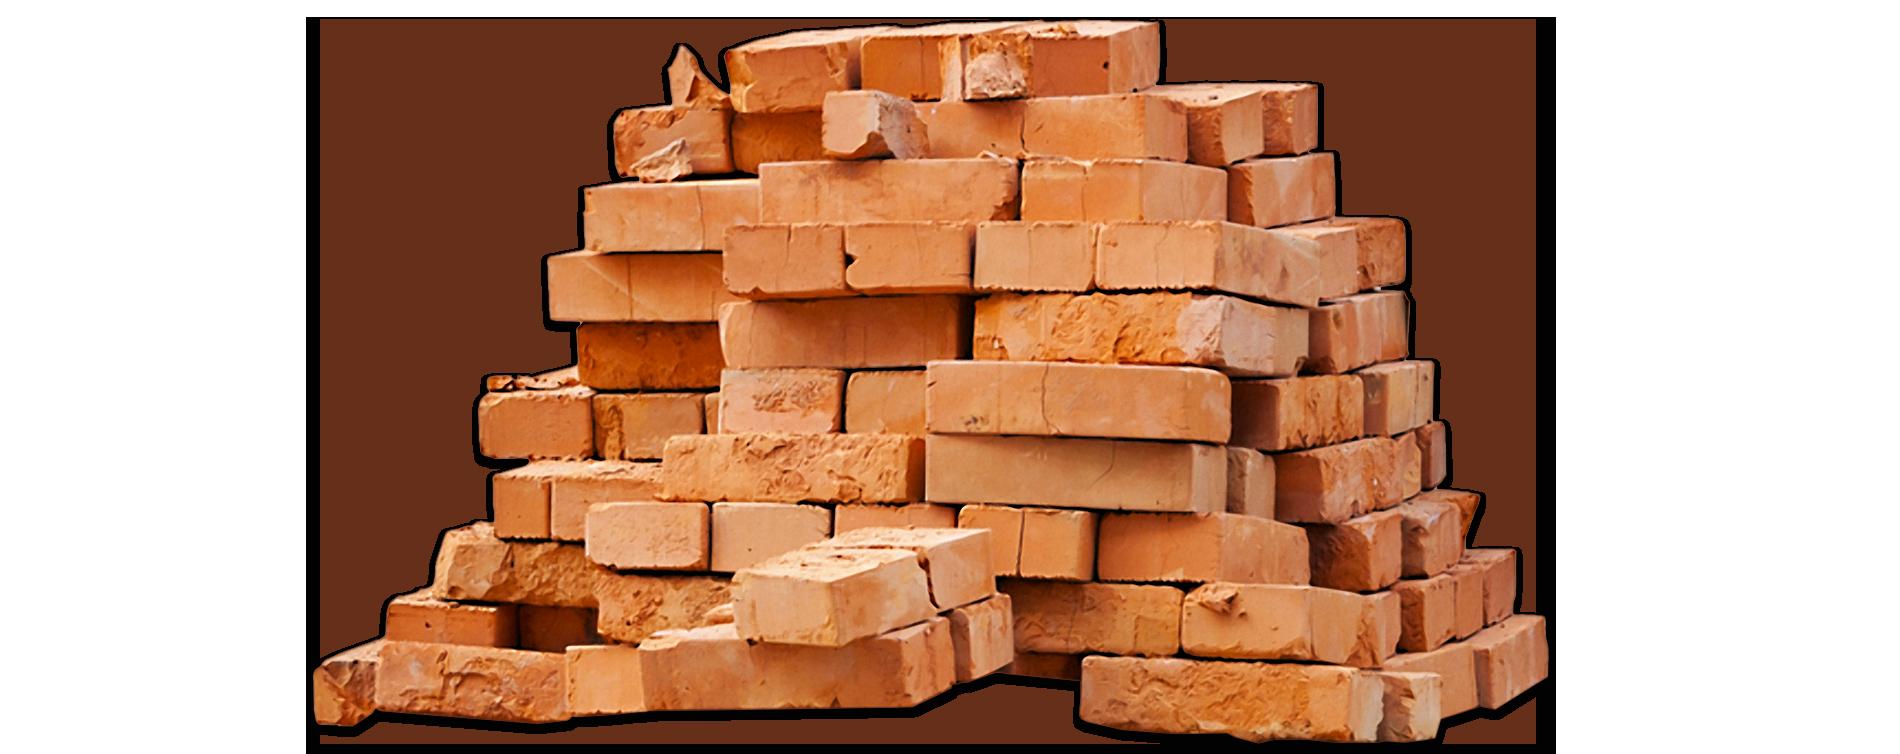 Bricks Png Image 39819